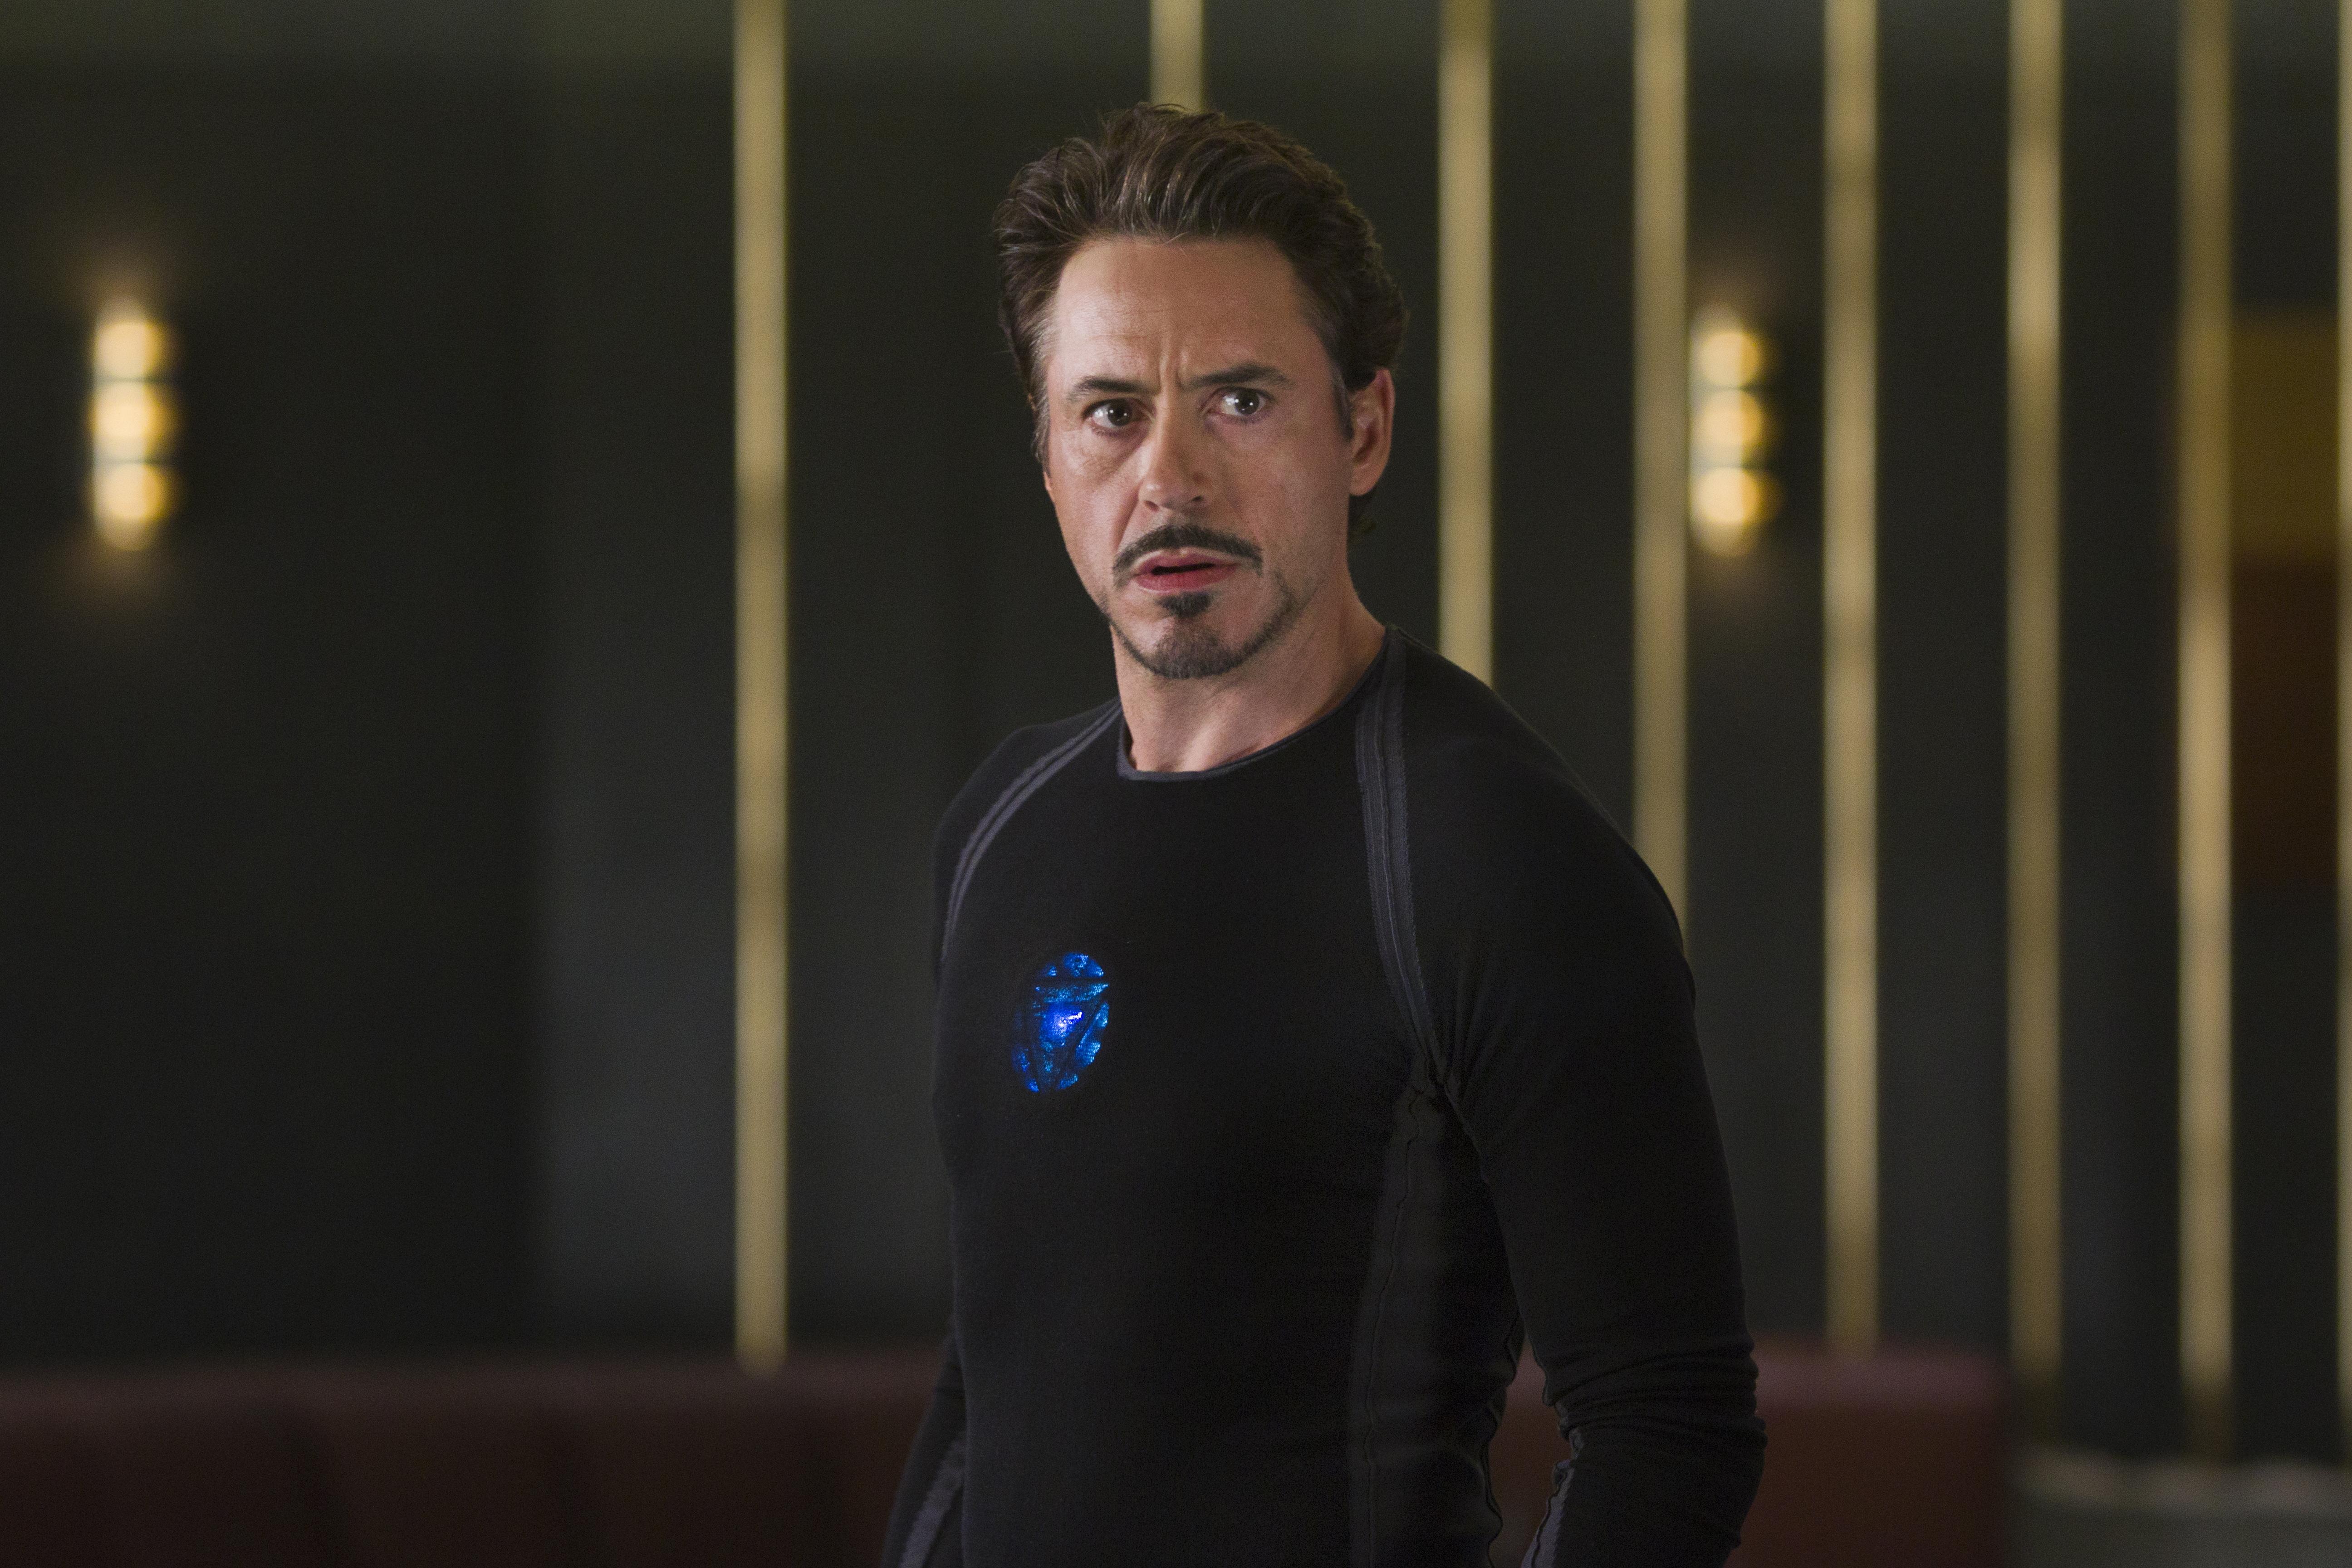 Image - Tony Stark Avengers 03.jpg - Marvel Movies Wiki - Wolverine ...